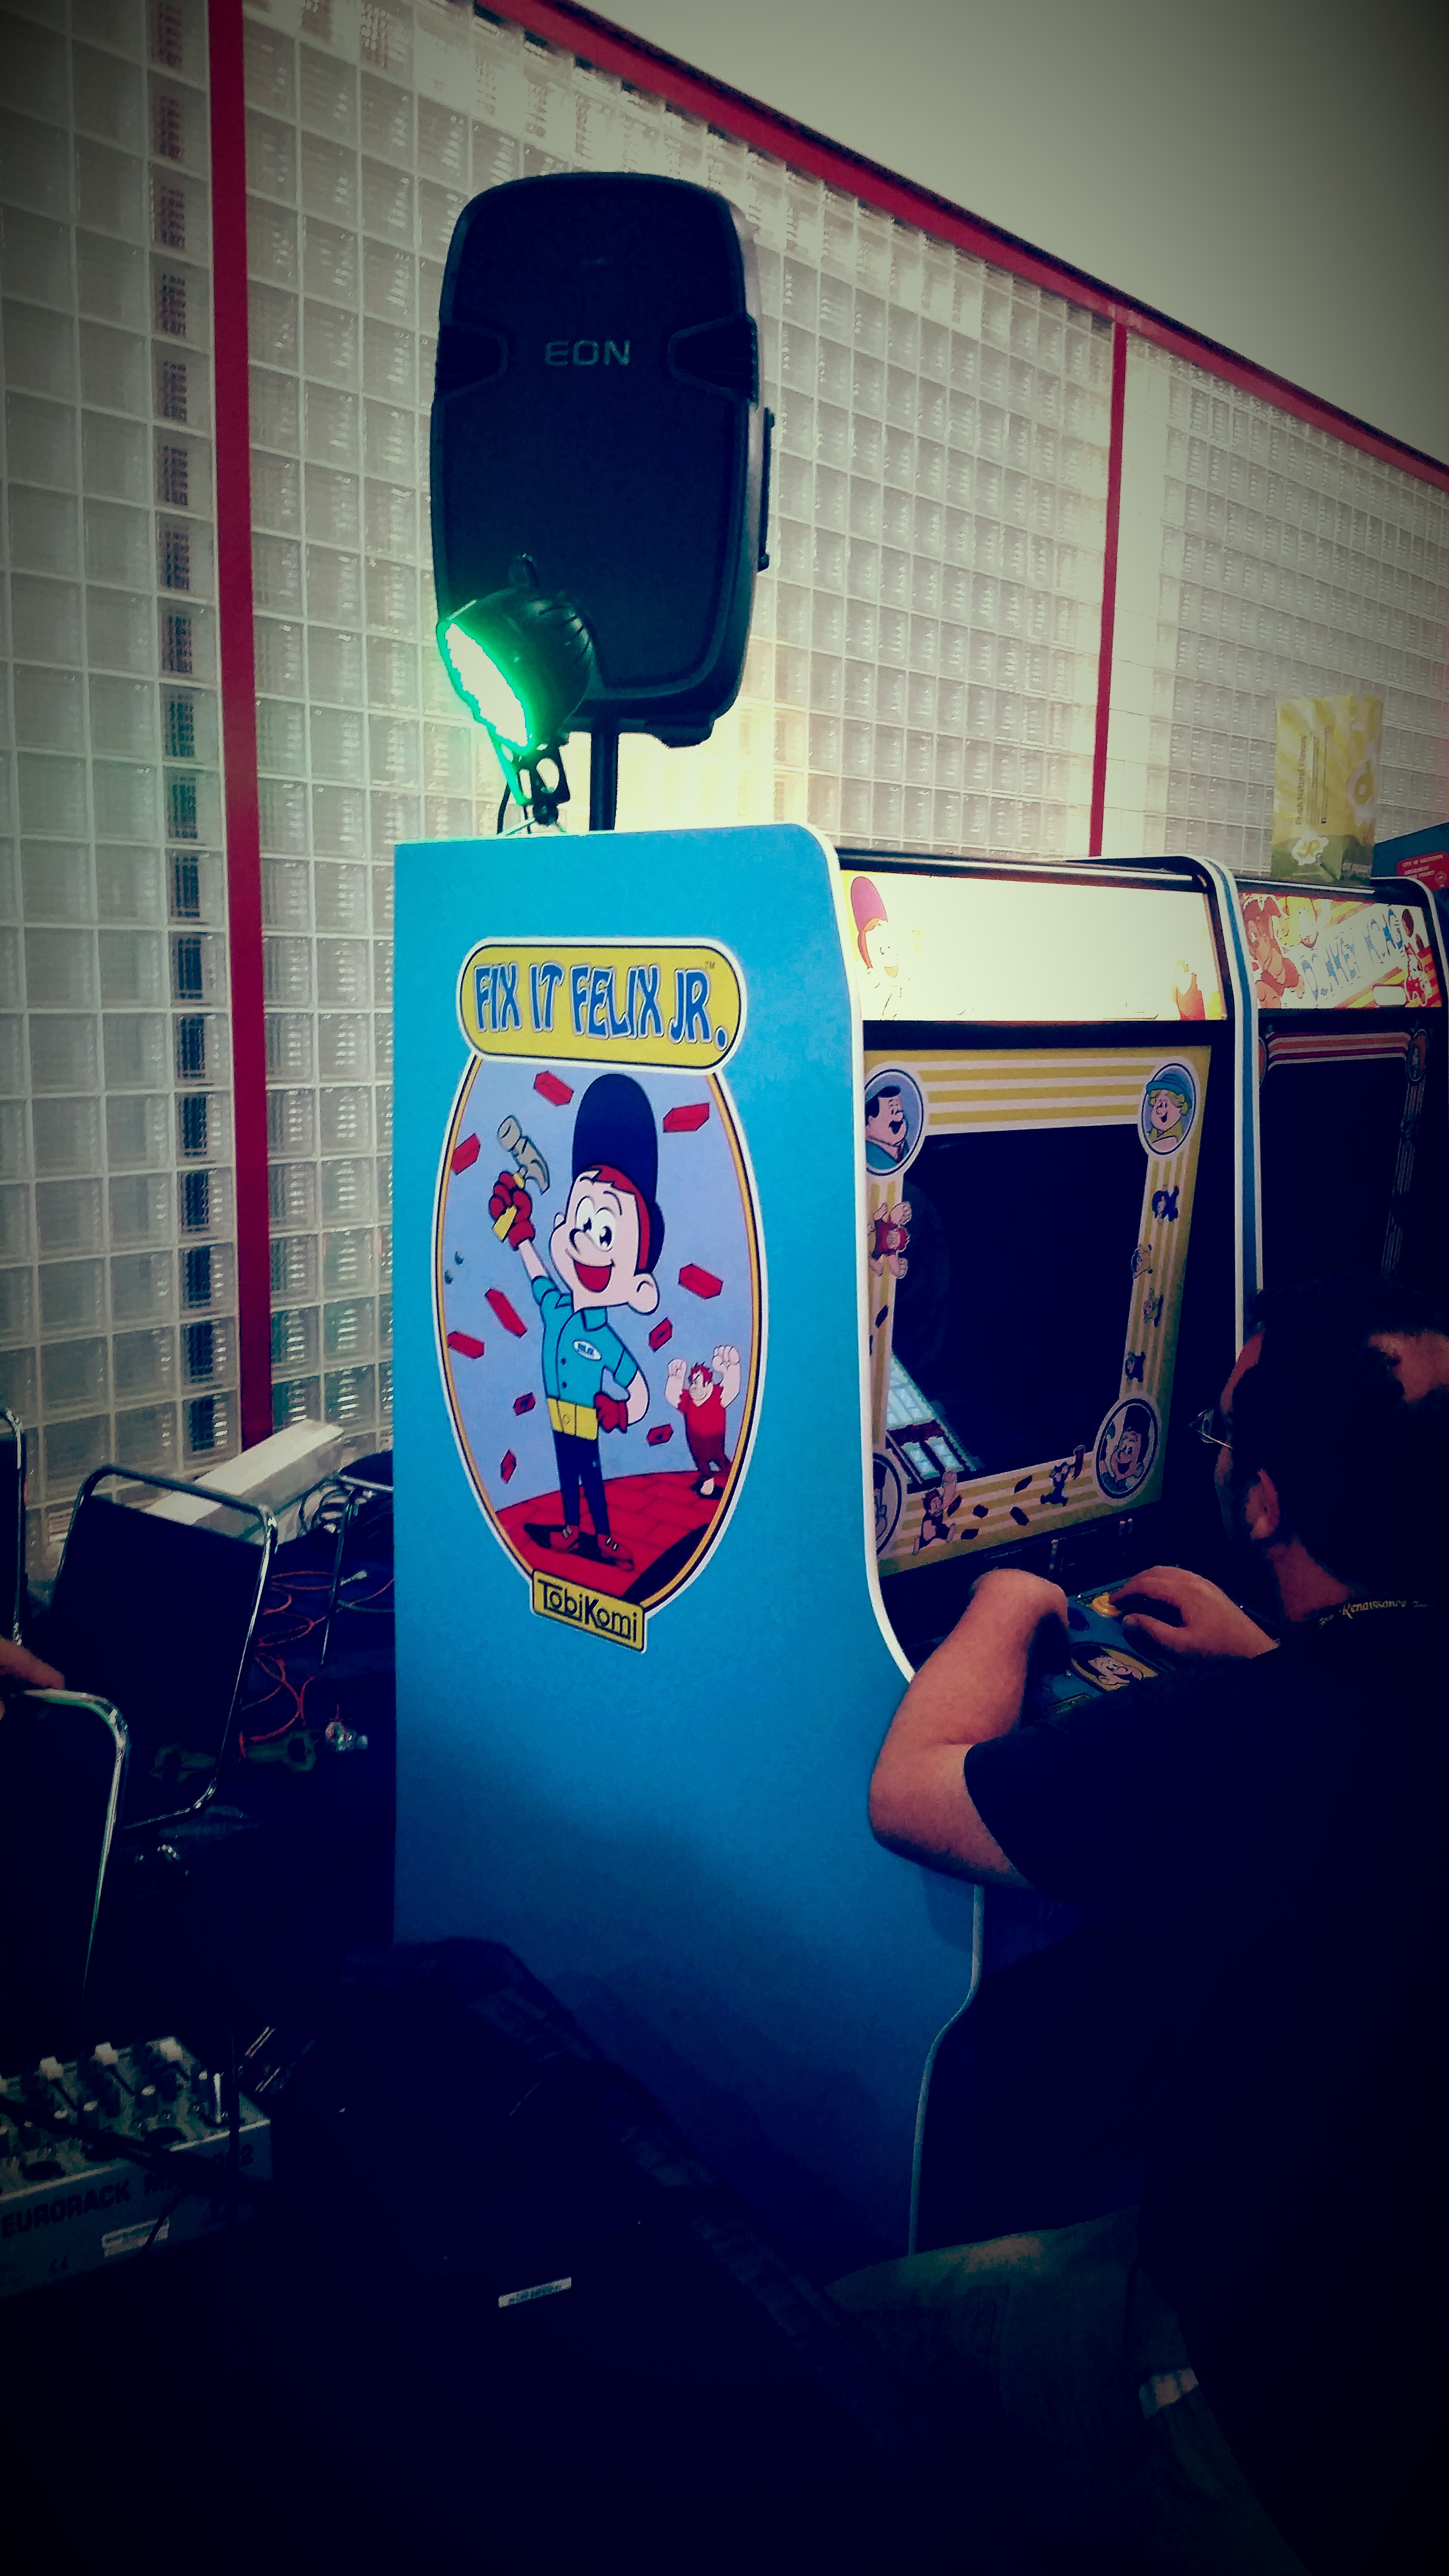 A fully functioning Fix It Felix Jr. arcade game